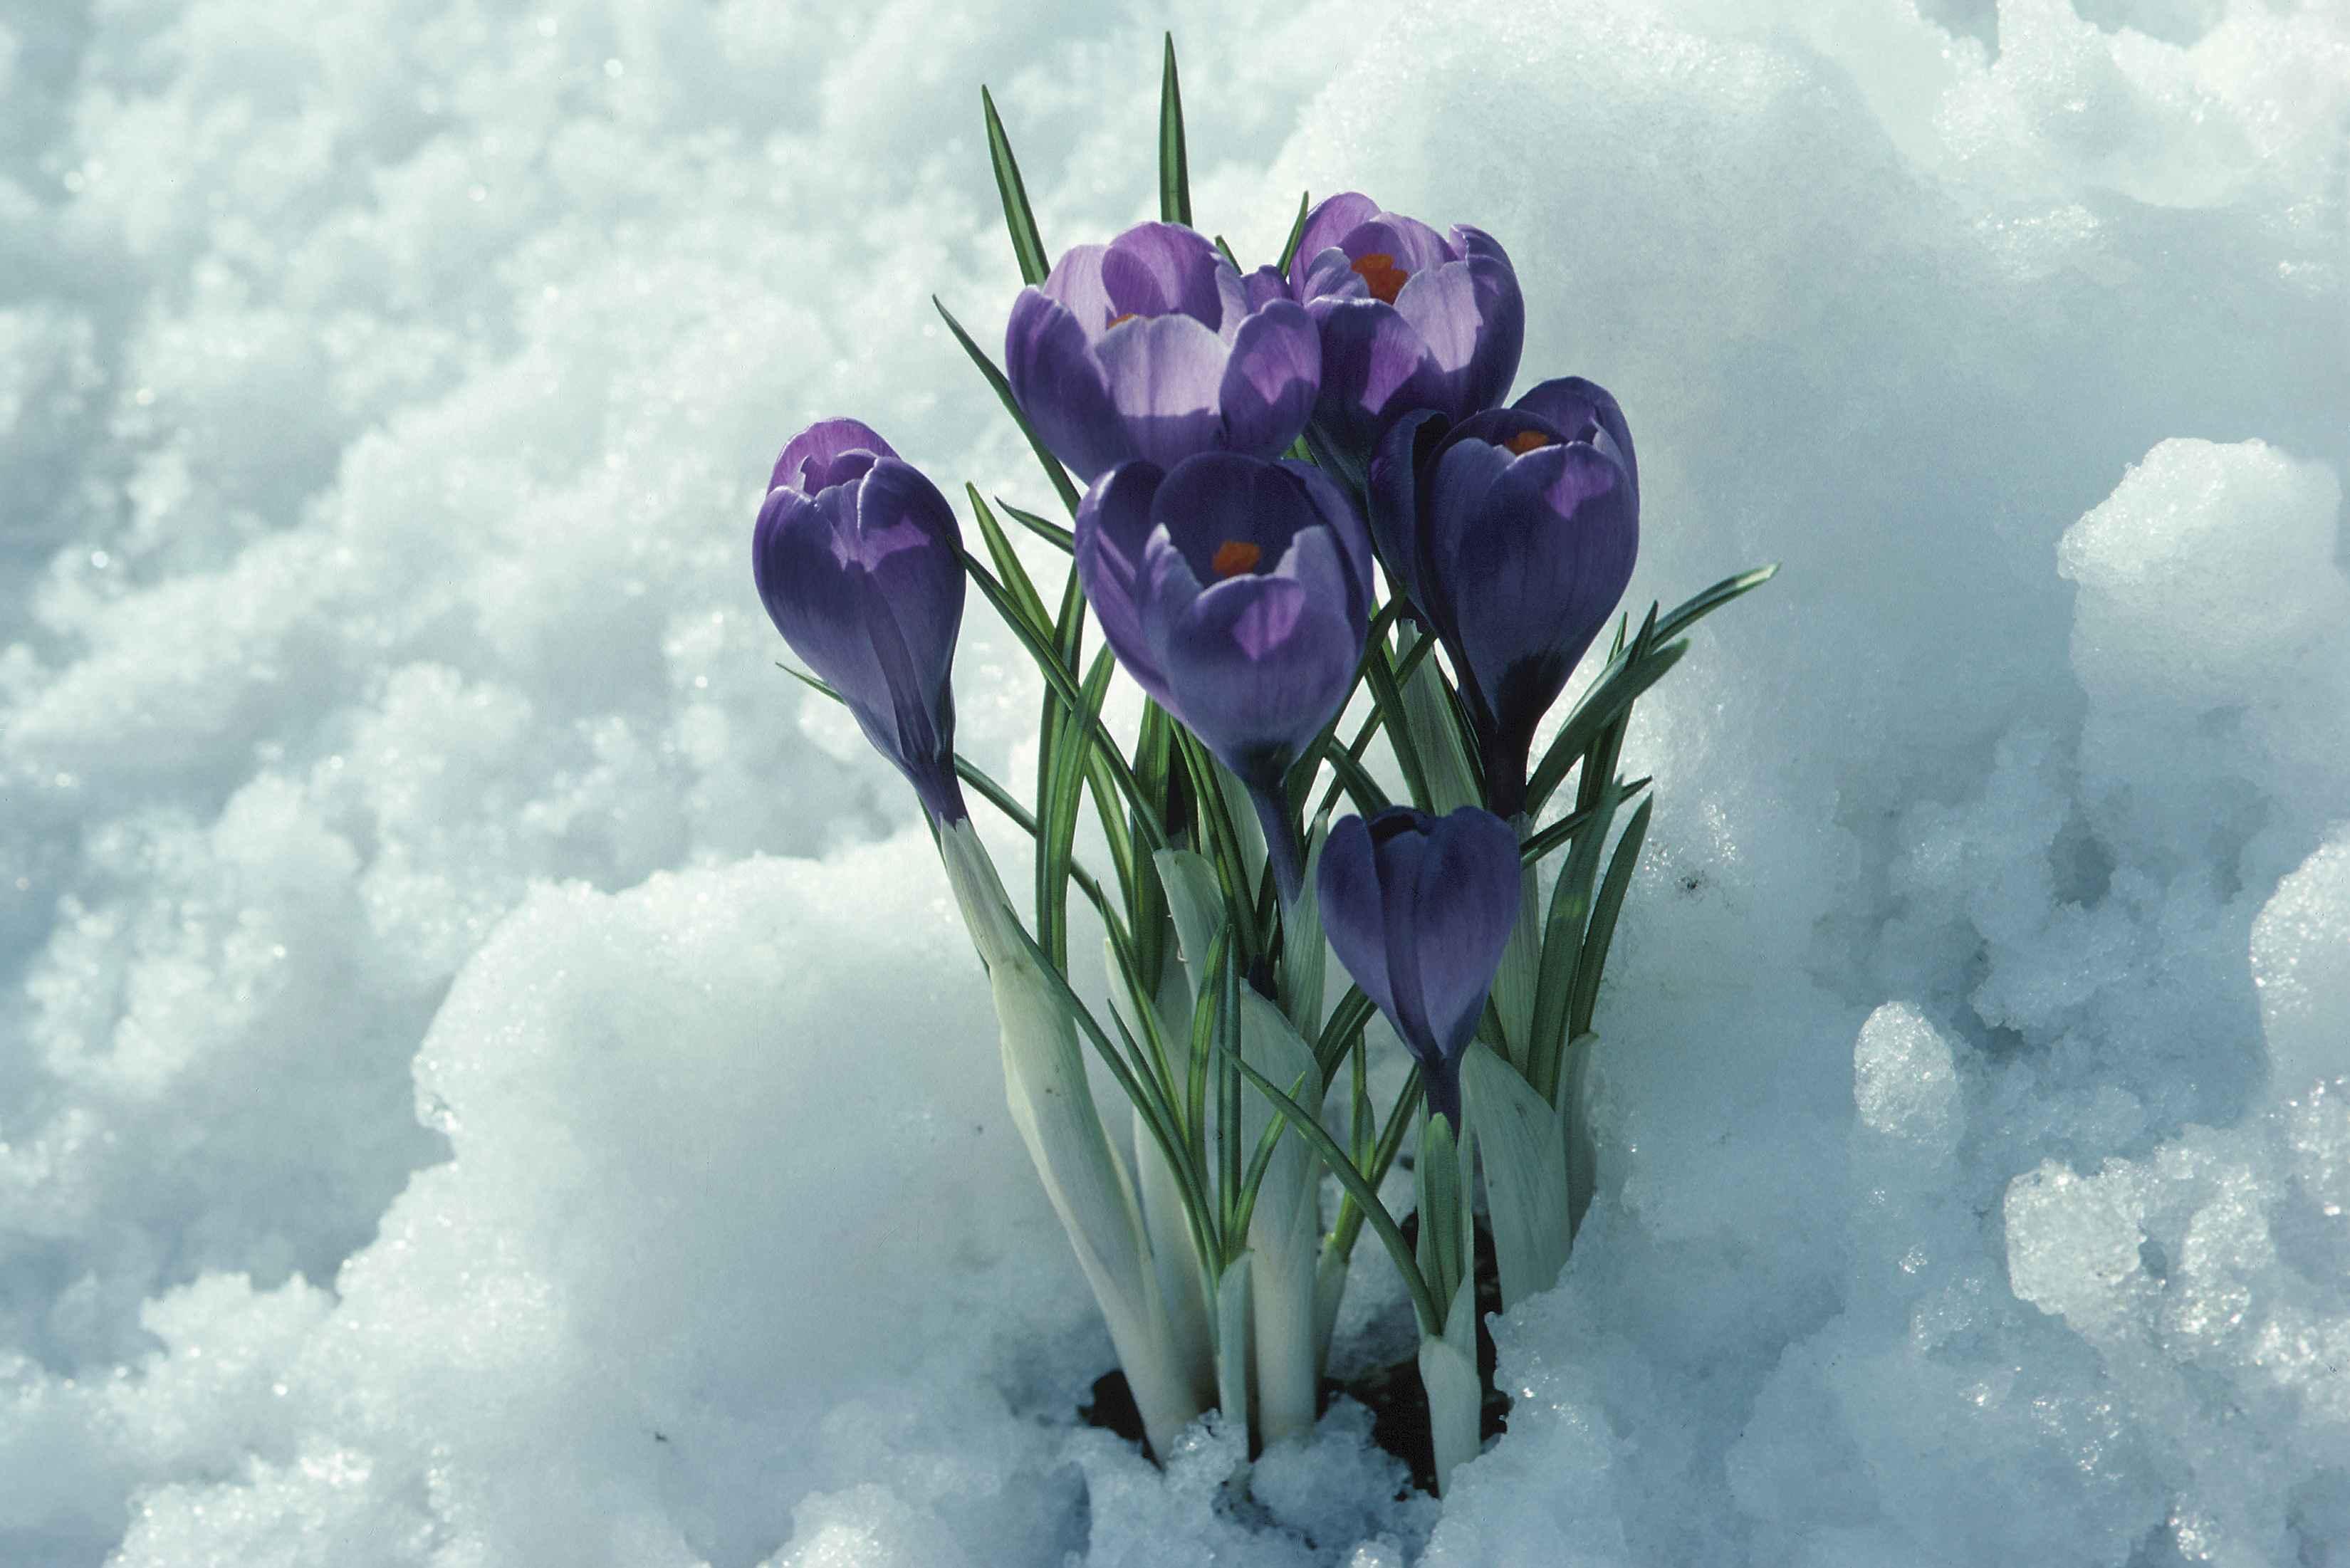 ice-flower-bloom